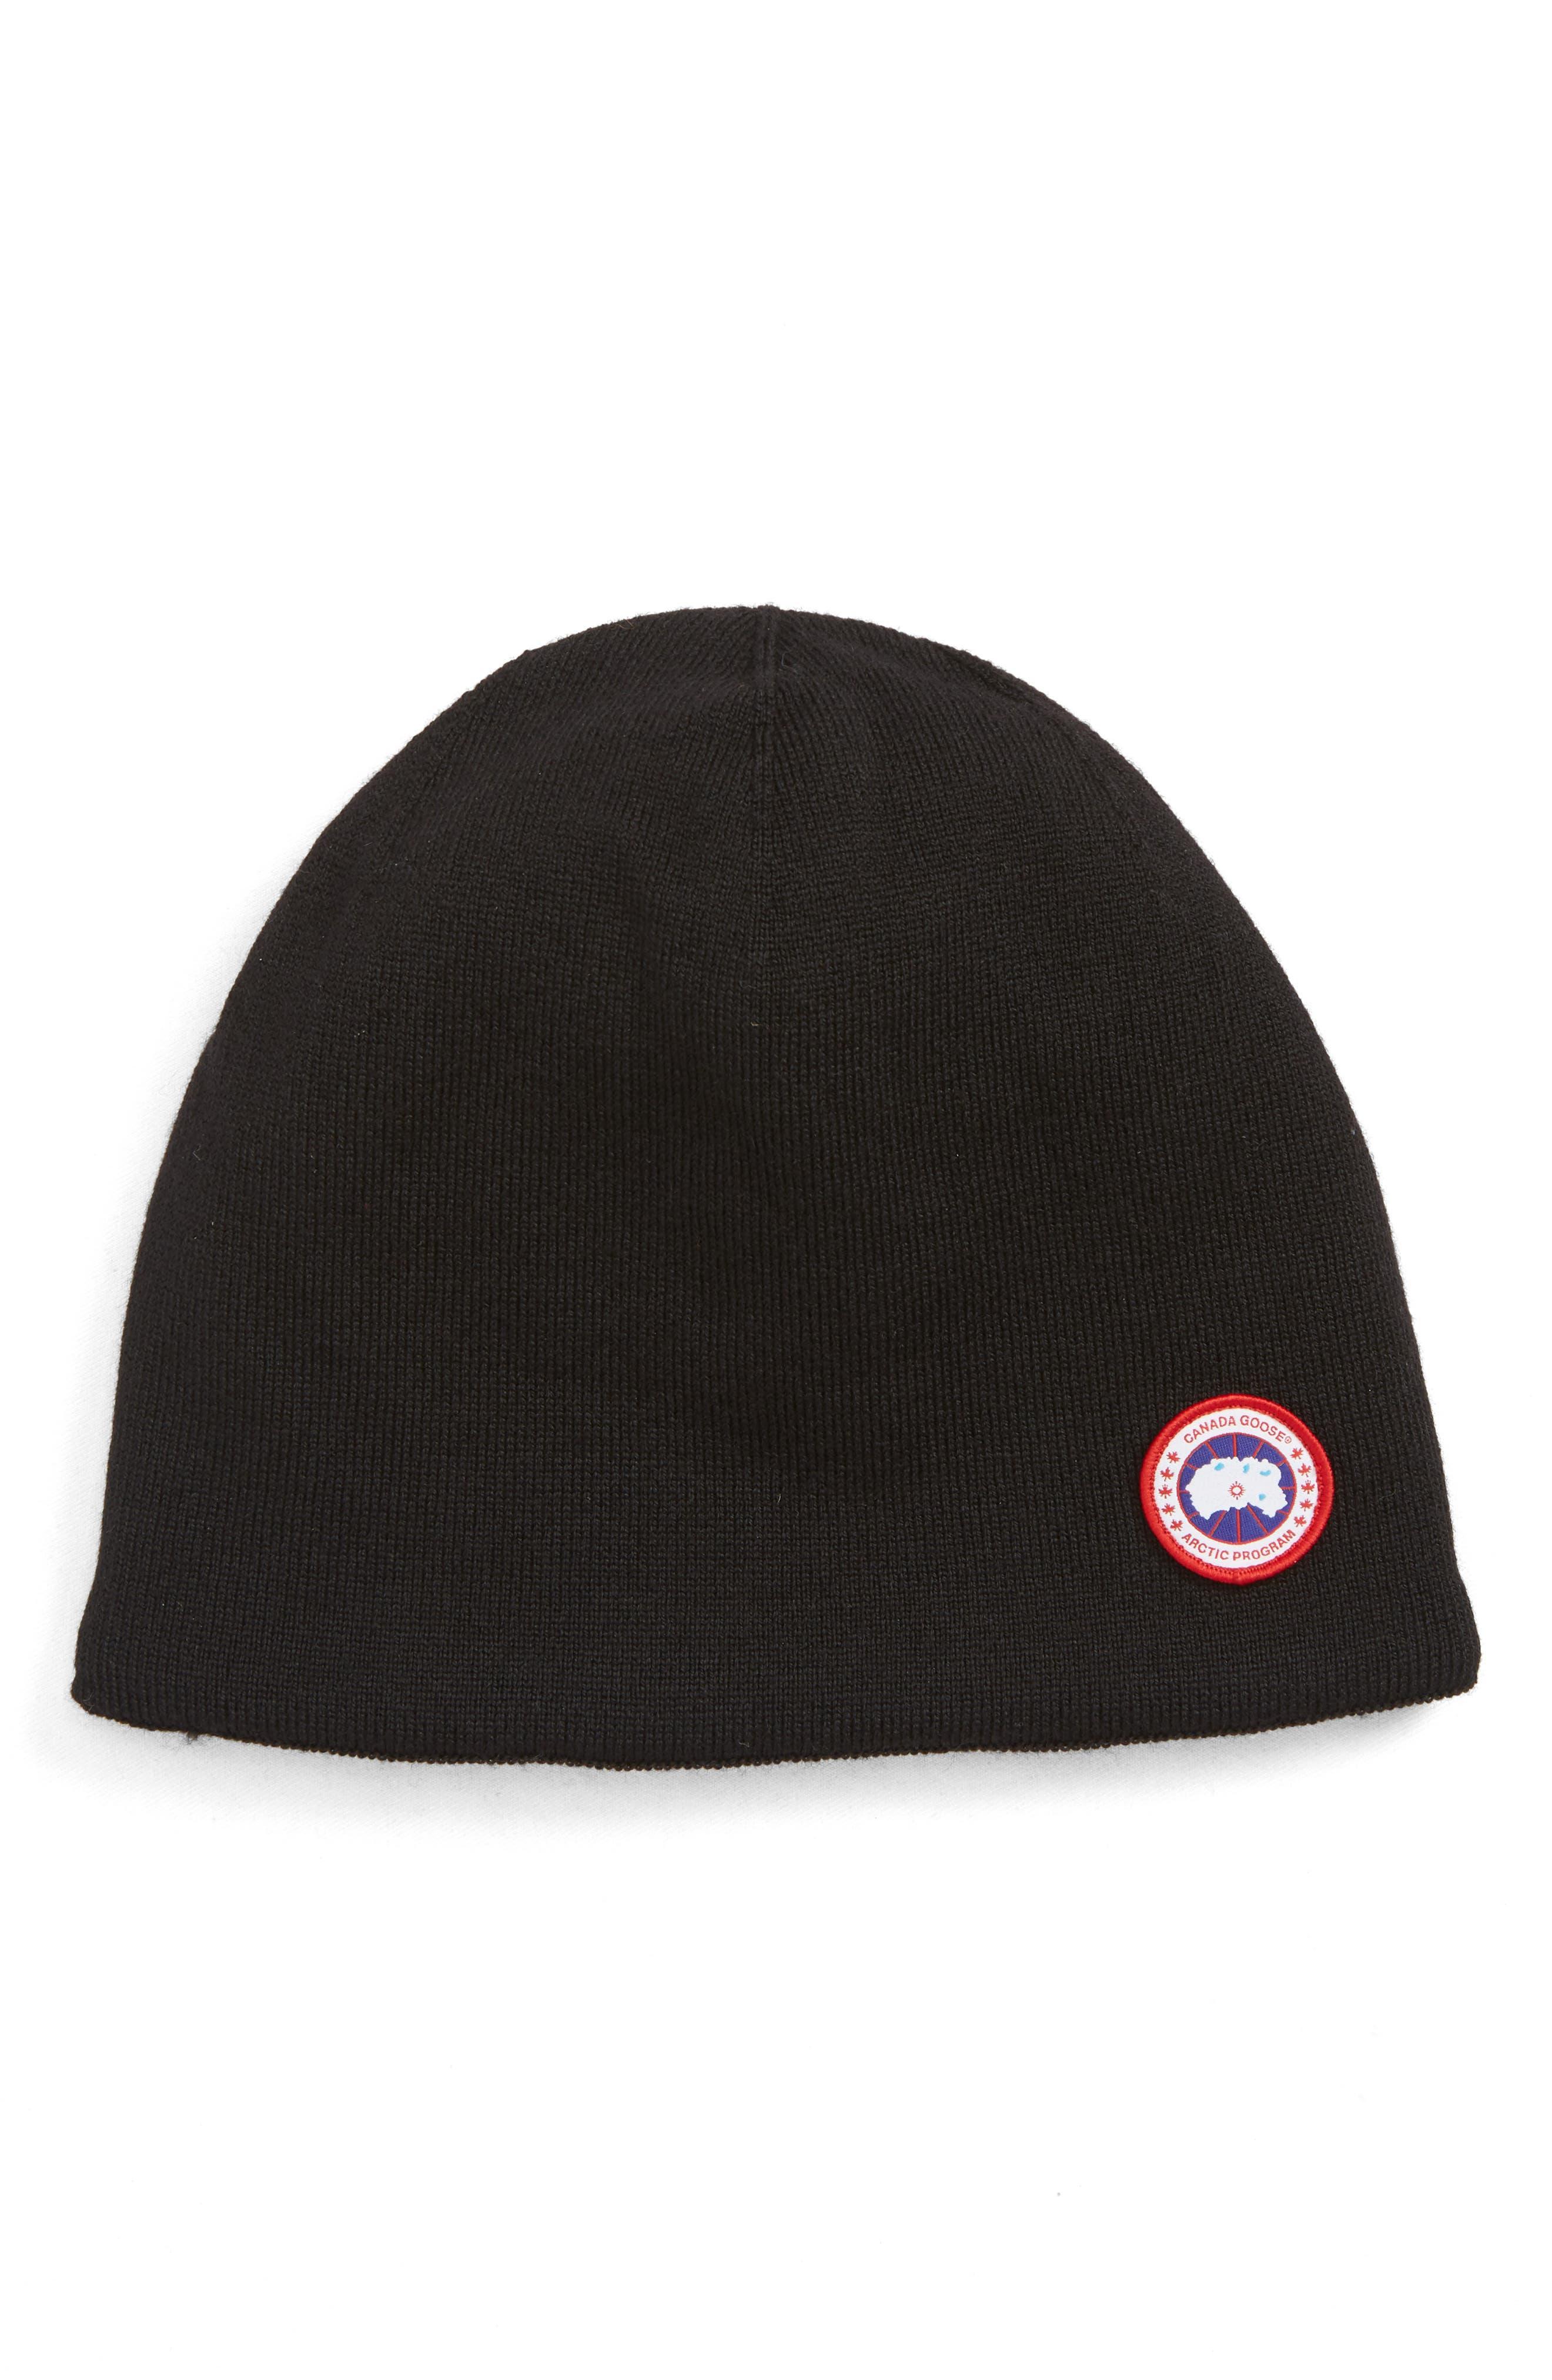 76271f53785 Men s Beanies  Knit Caps   Winter Hats